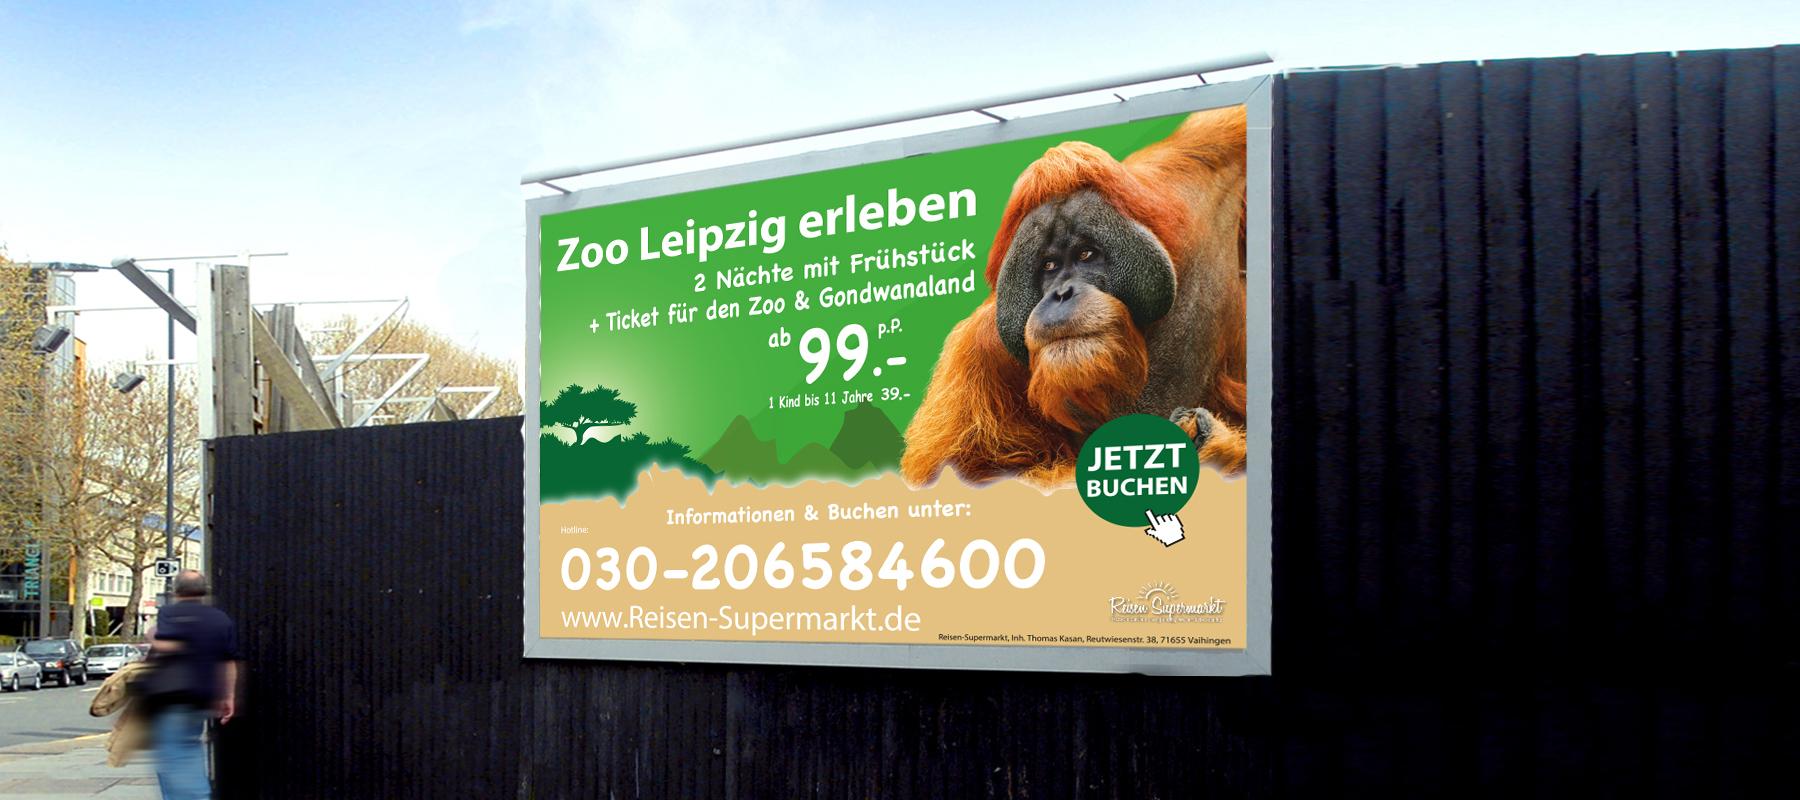 Zoo Leipzig - 2 Nächte mit Tageseintrittskarte